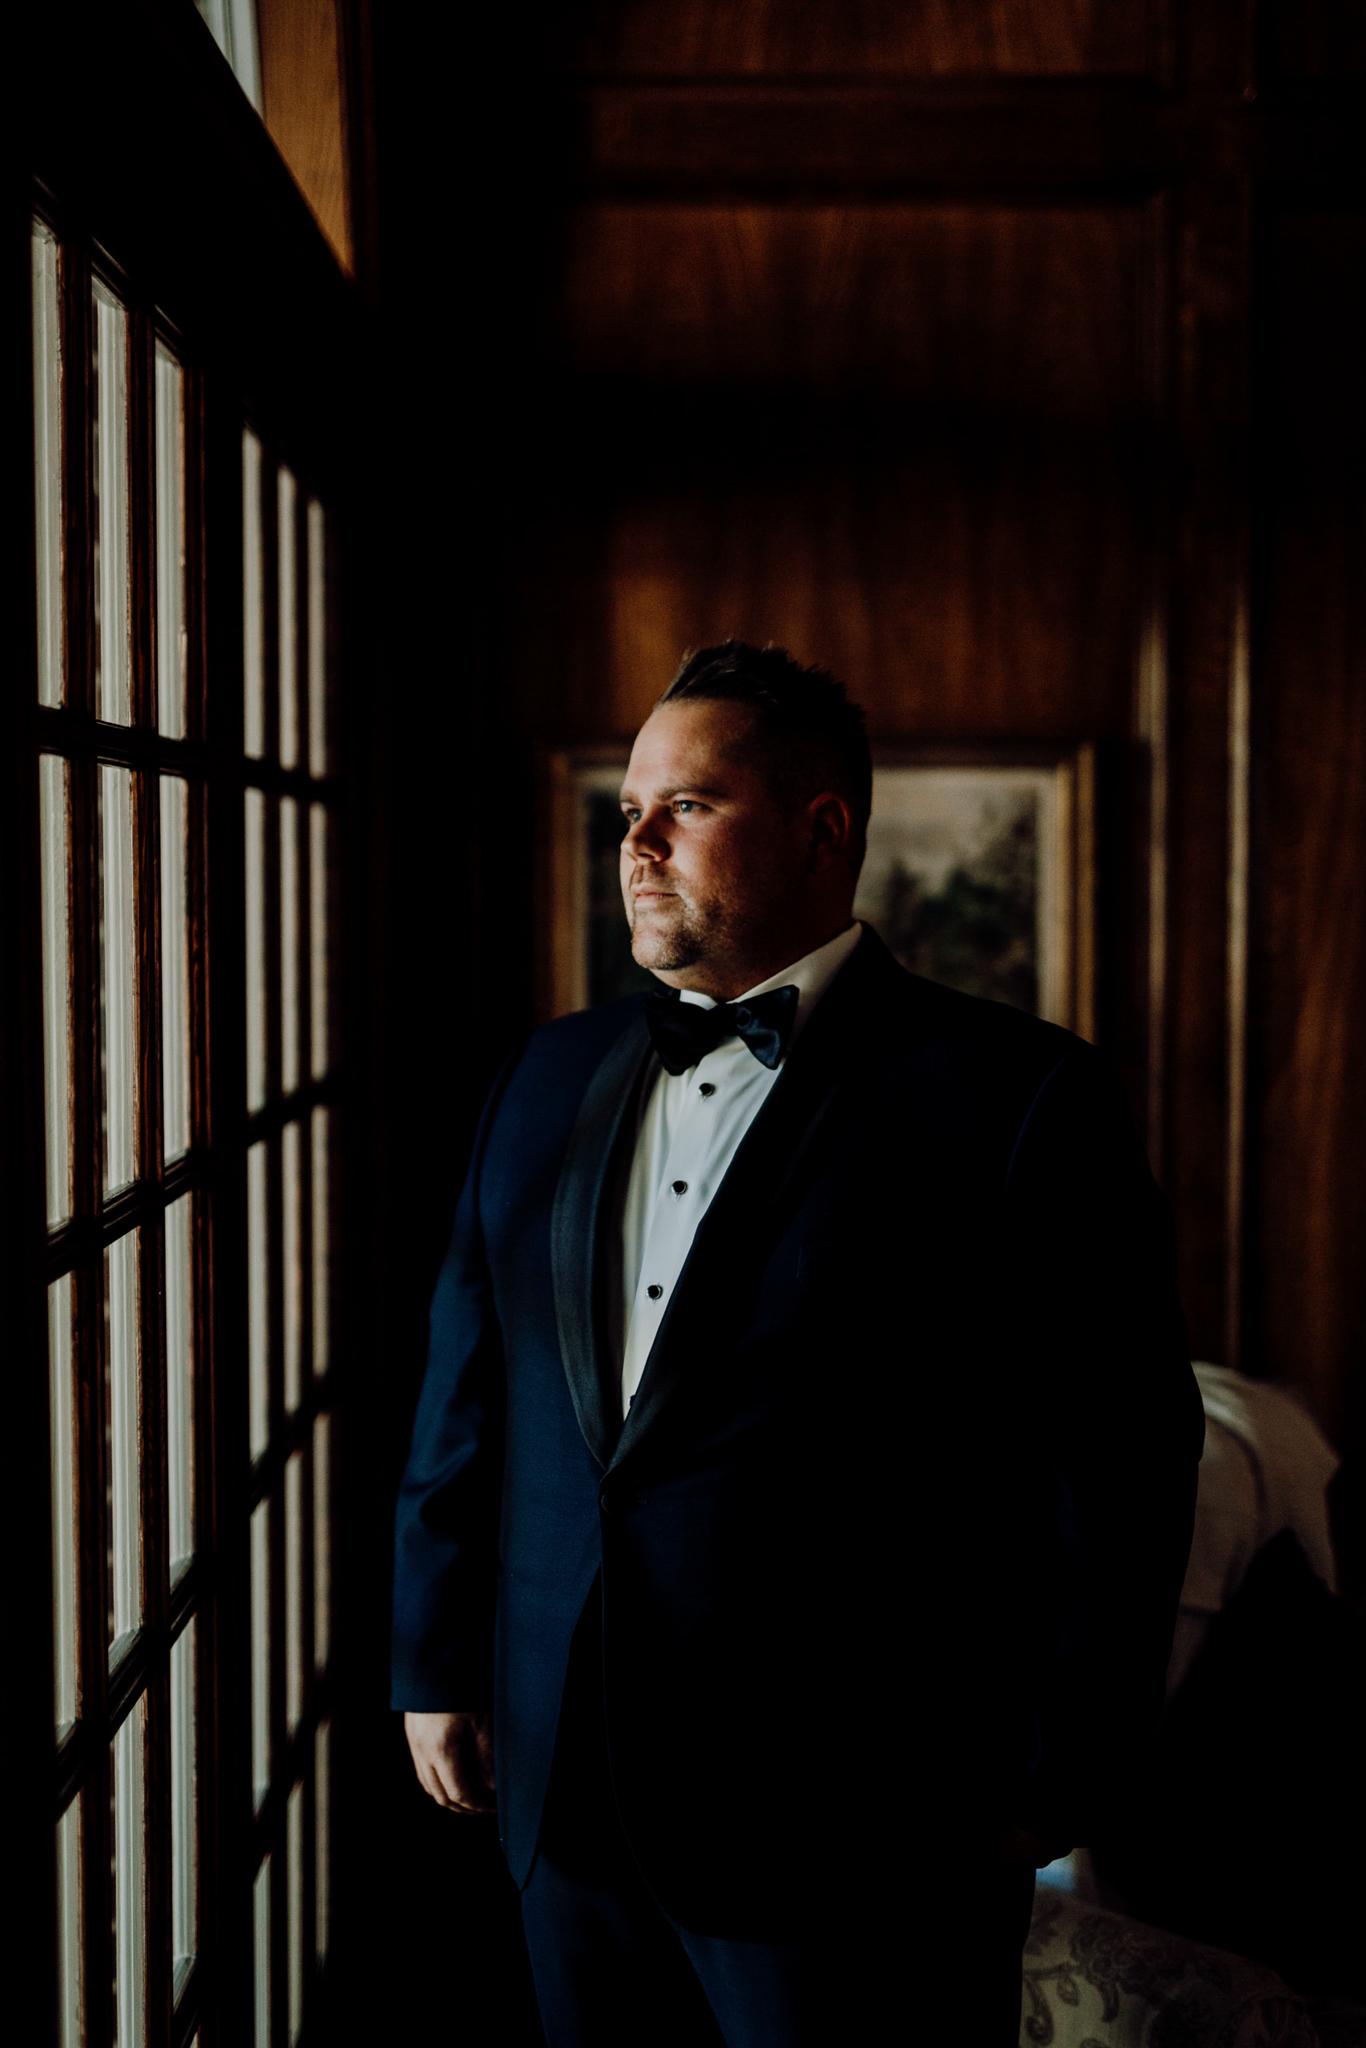 Houston Wedding Photographer-Intimate Texas Backyard Wedding- Houston Wedding Photographer -Kristen Giles Photography-19.jpg